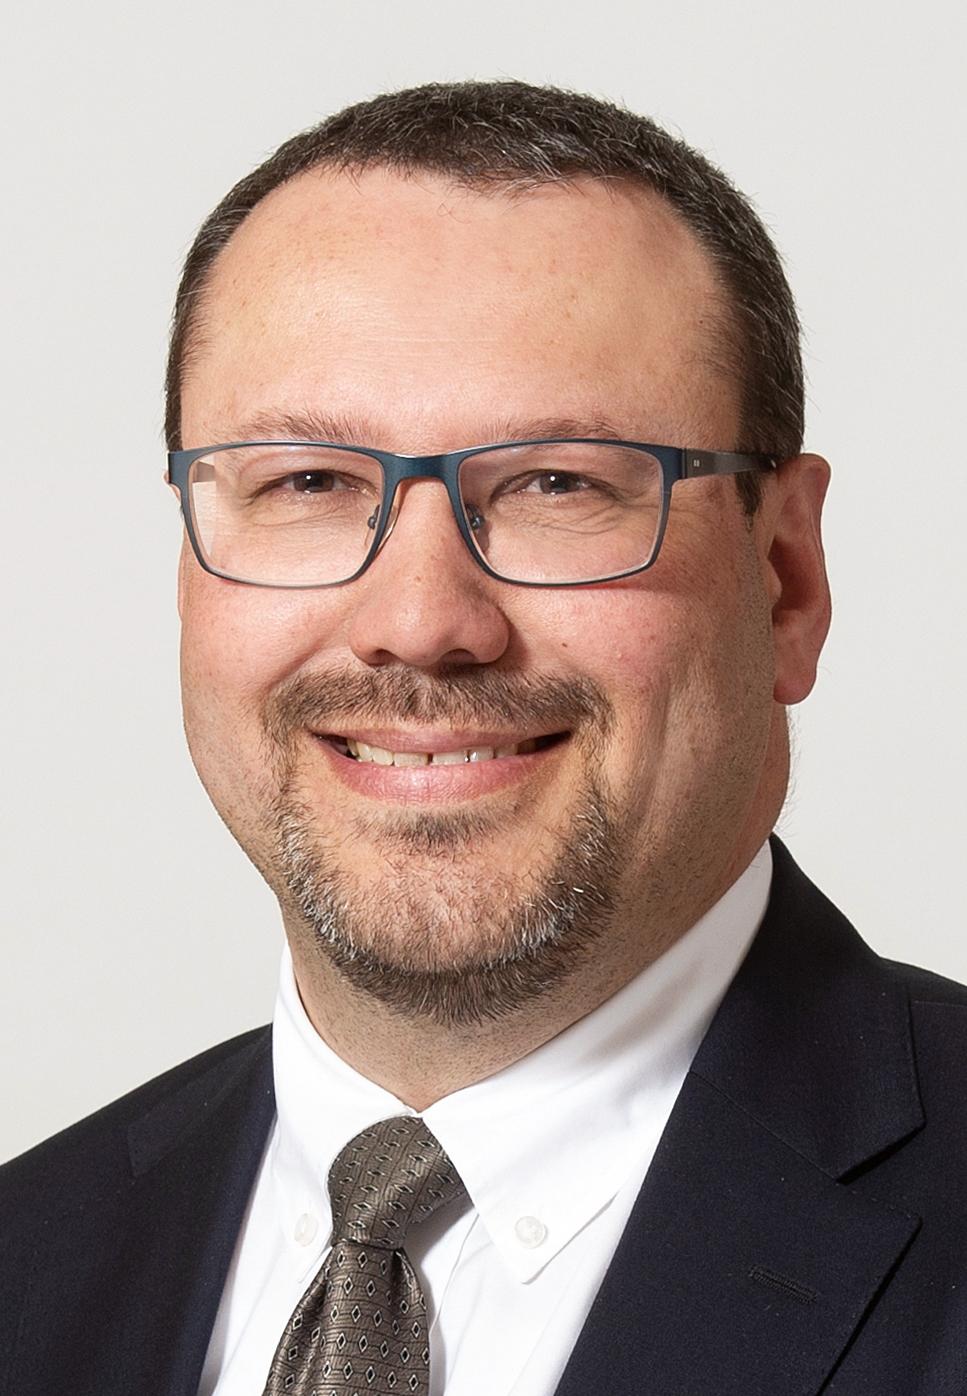 David Winteler